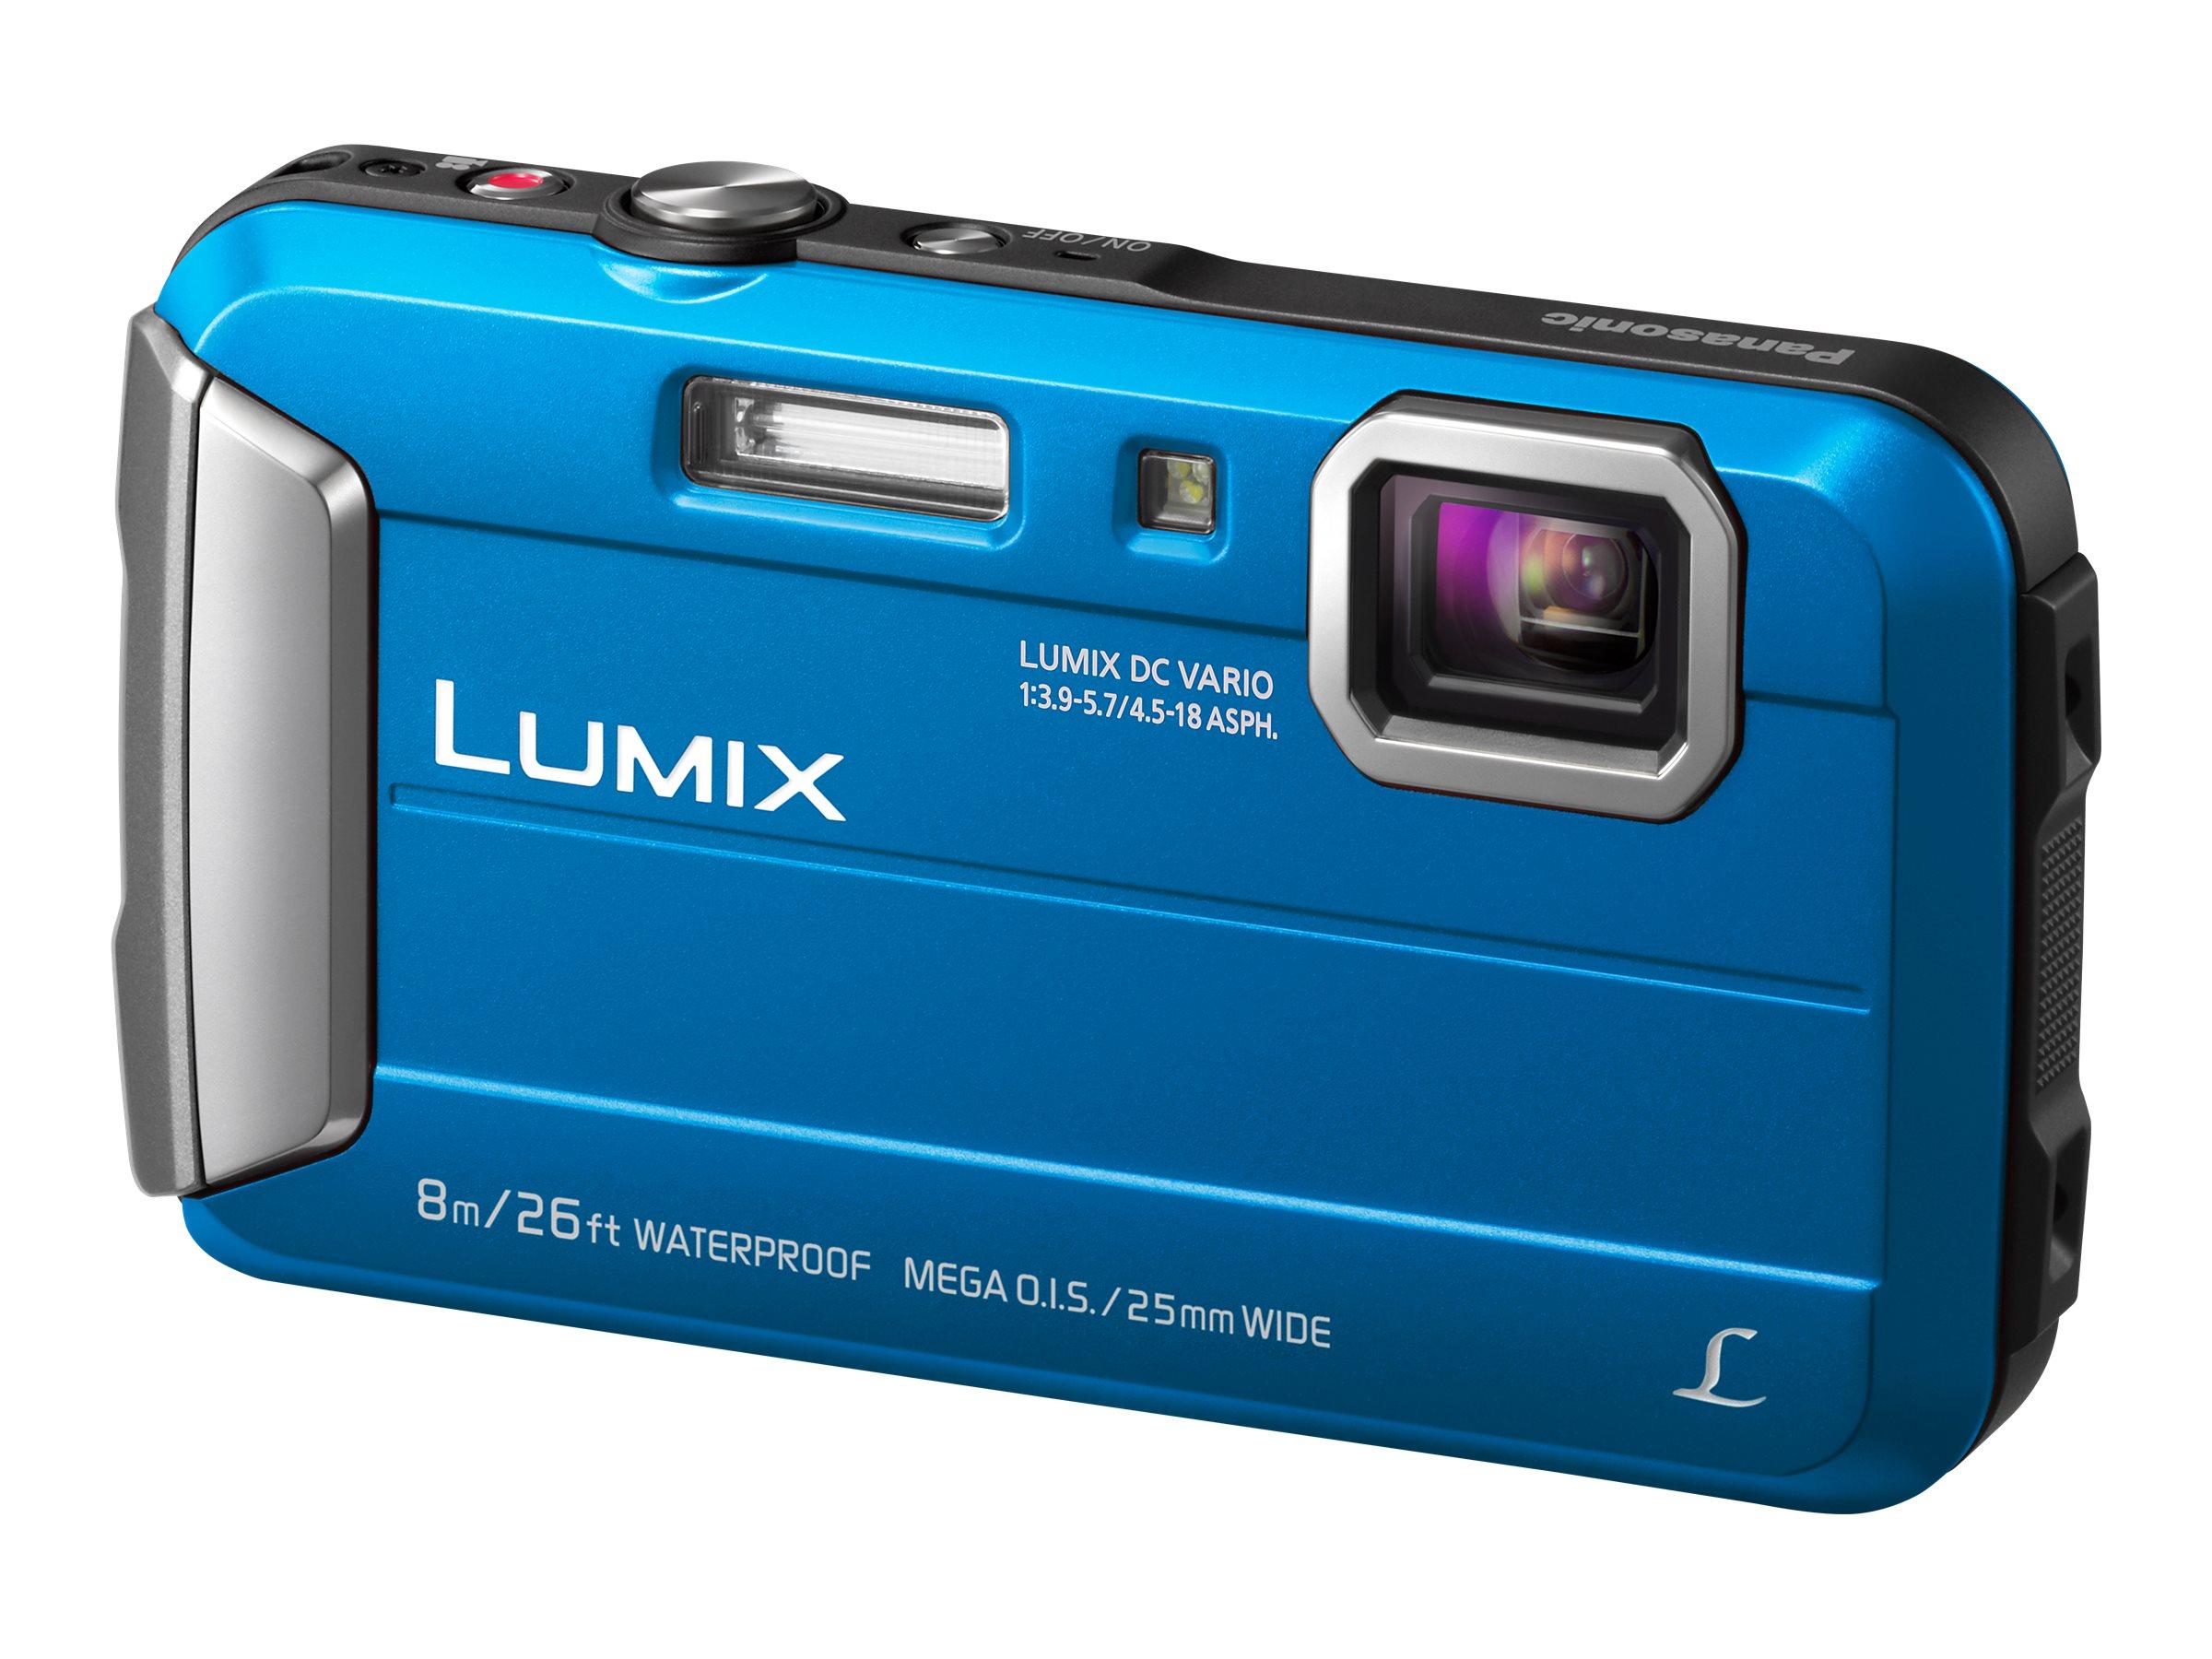 Panasonic Lumix DMC-FT30 - Digitalkamera - Kompaktkamera - 16.1 MPix - 720p - 4x optischer Zoom